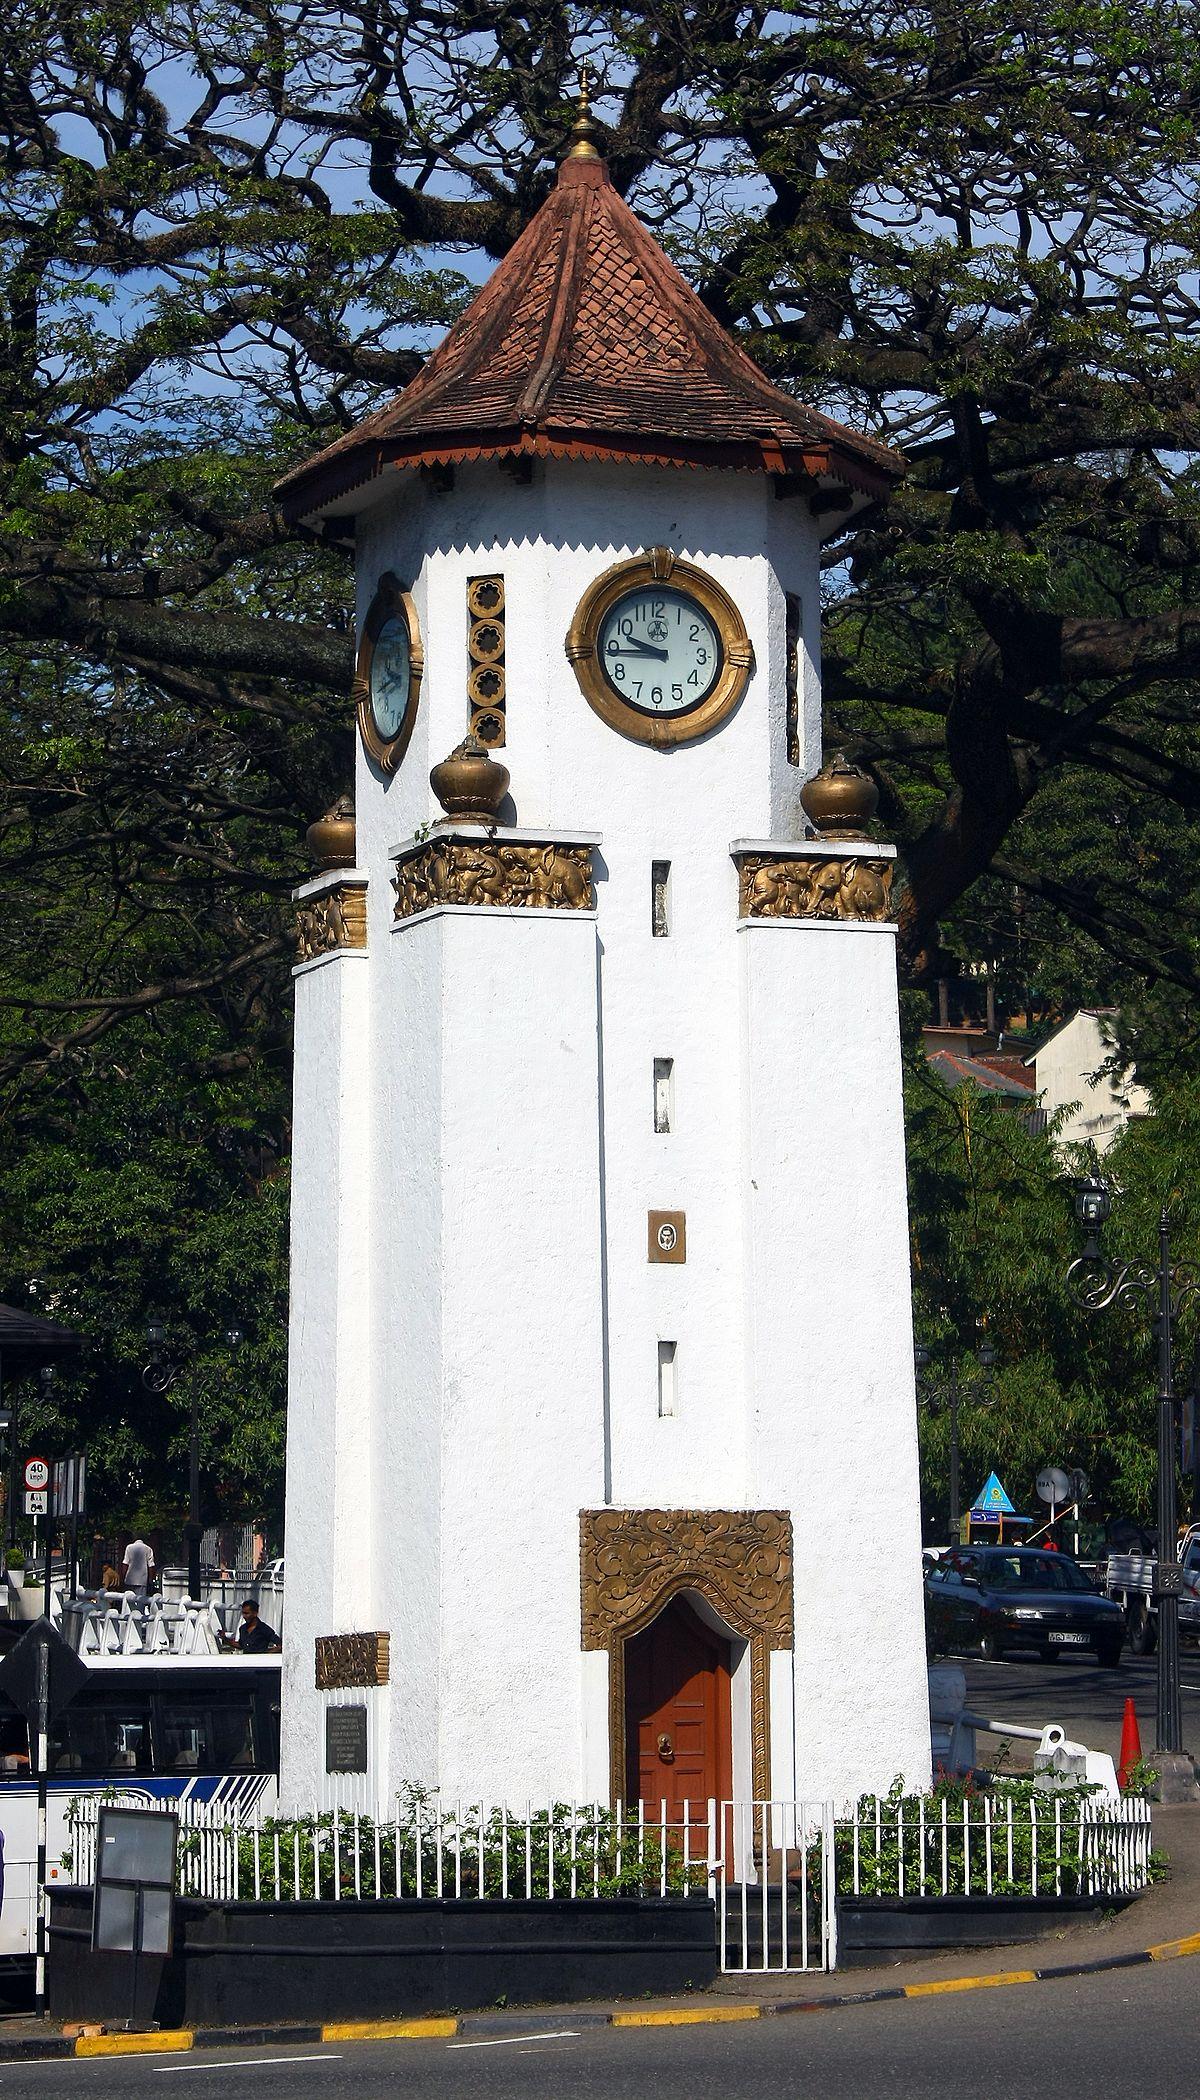 Px Kandy Clock Tower C